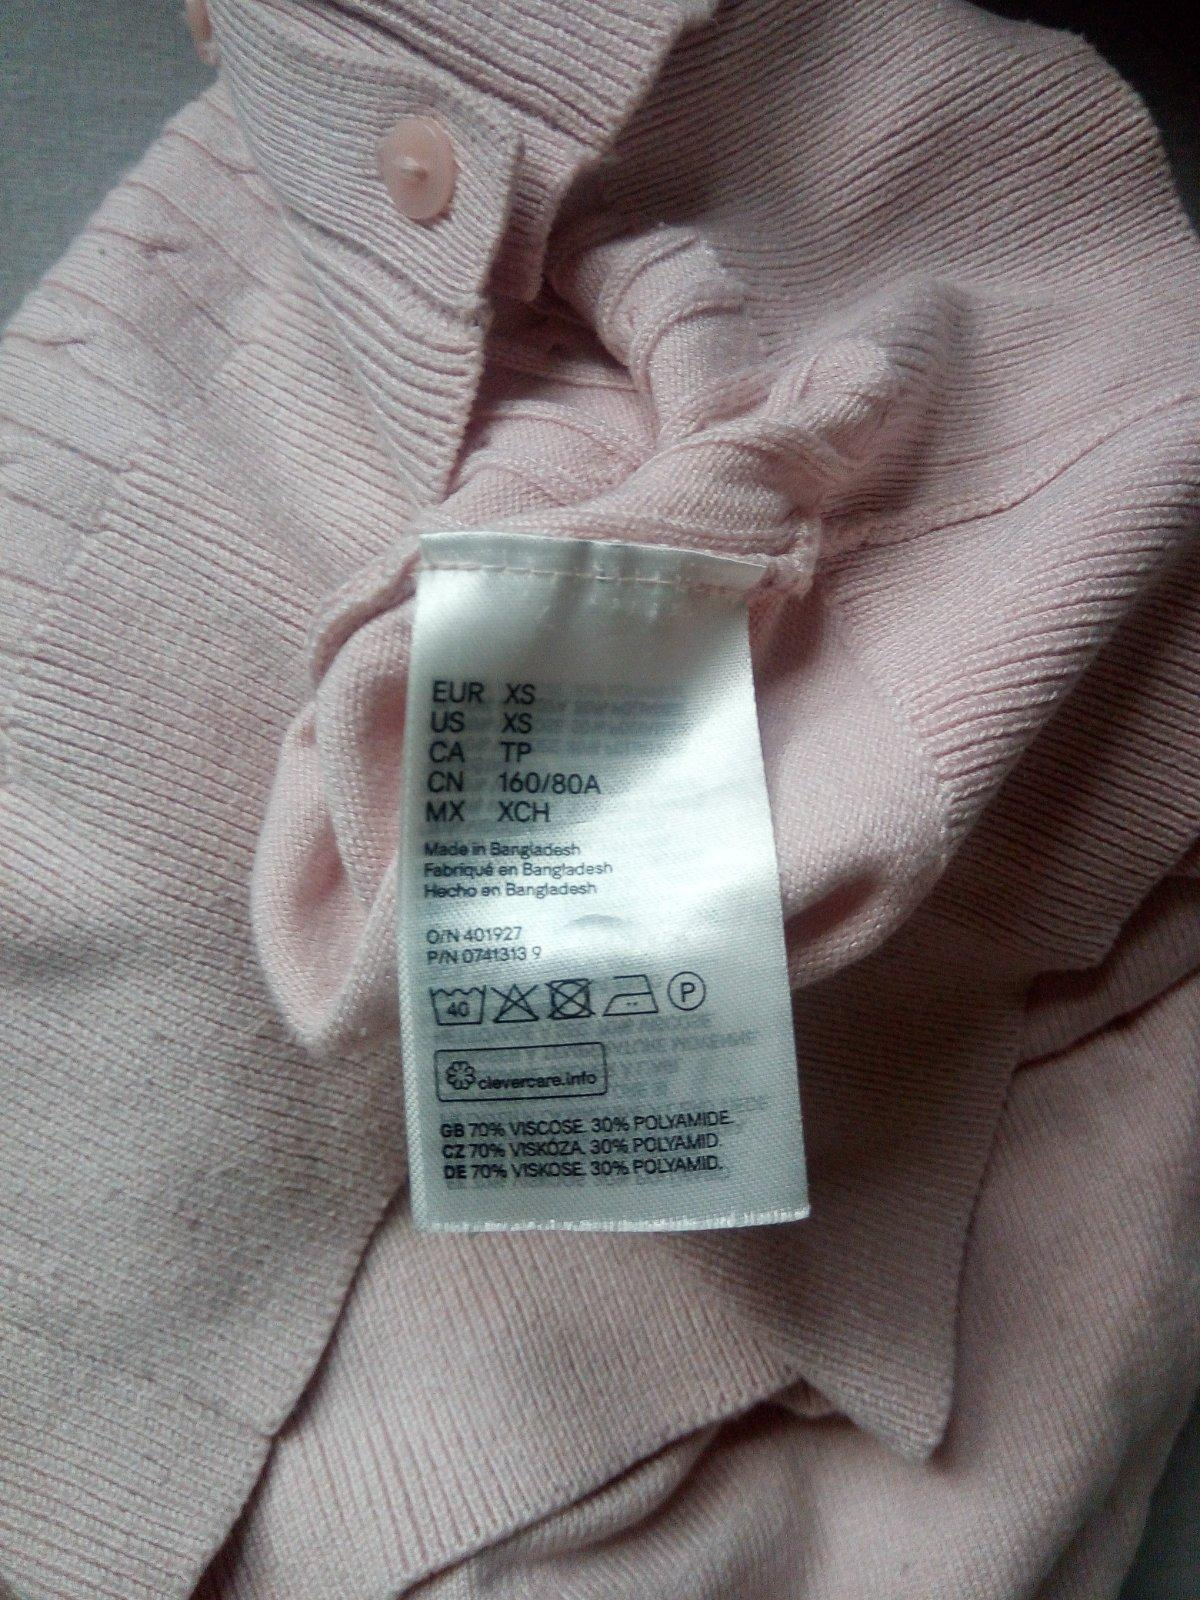 Bledoružový svetrík H&M, XS - Obrázok č. 3